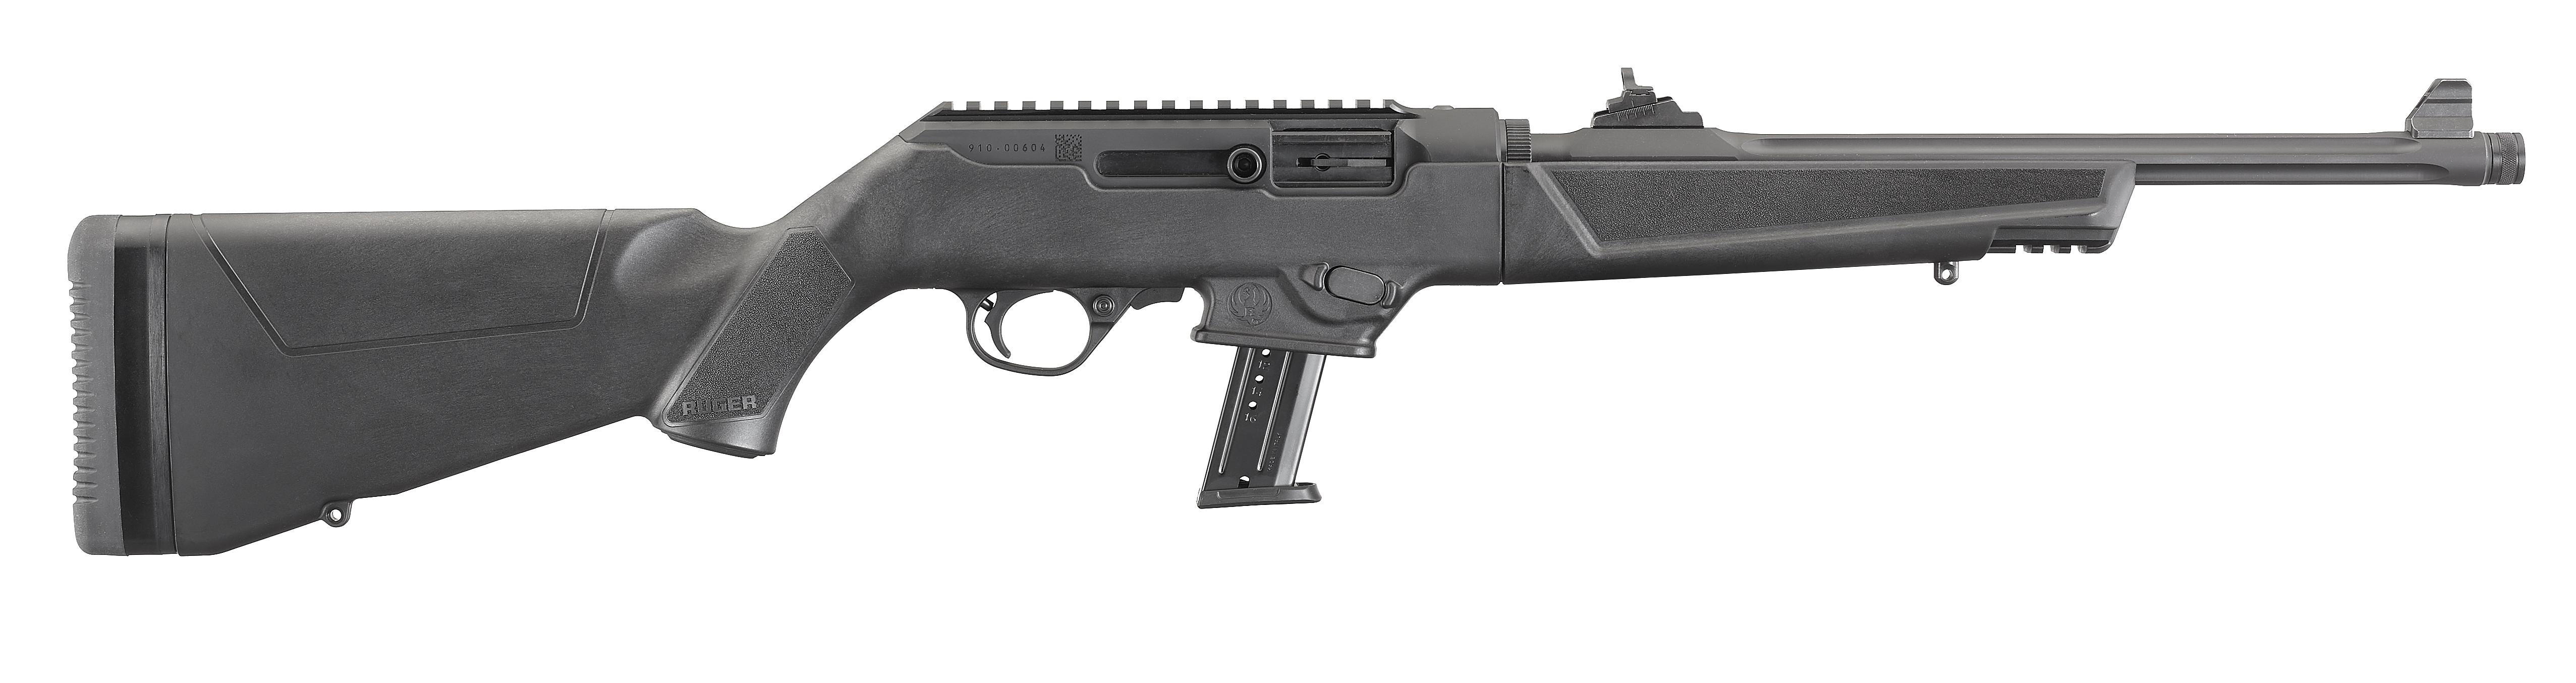 PC Carbine 9x19